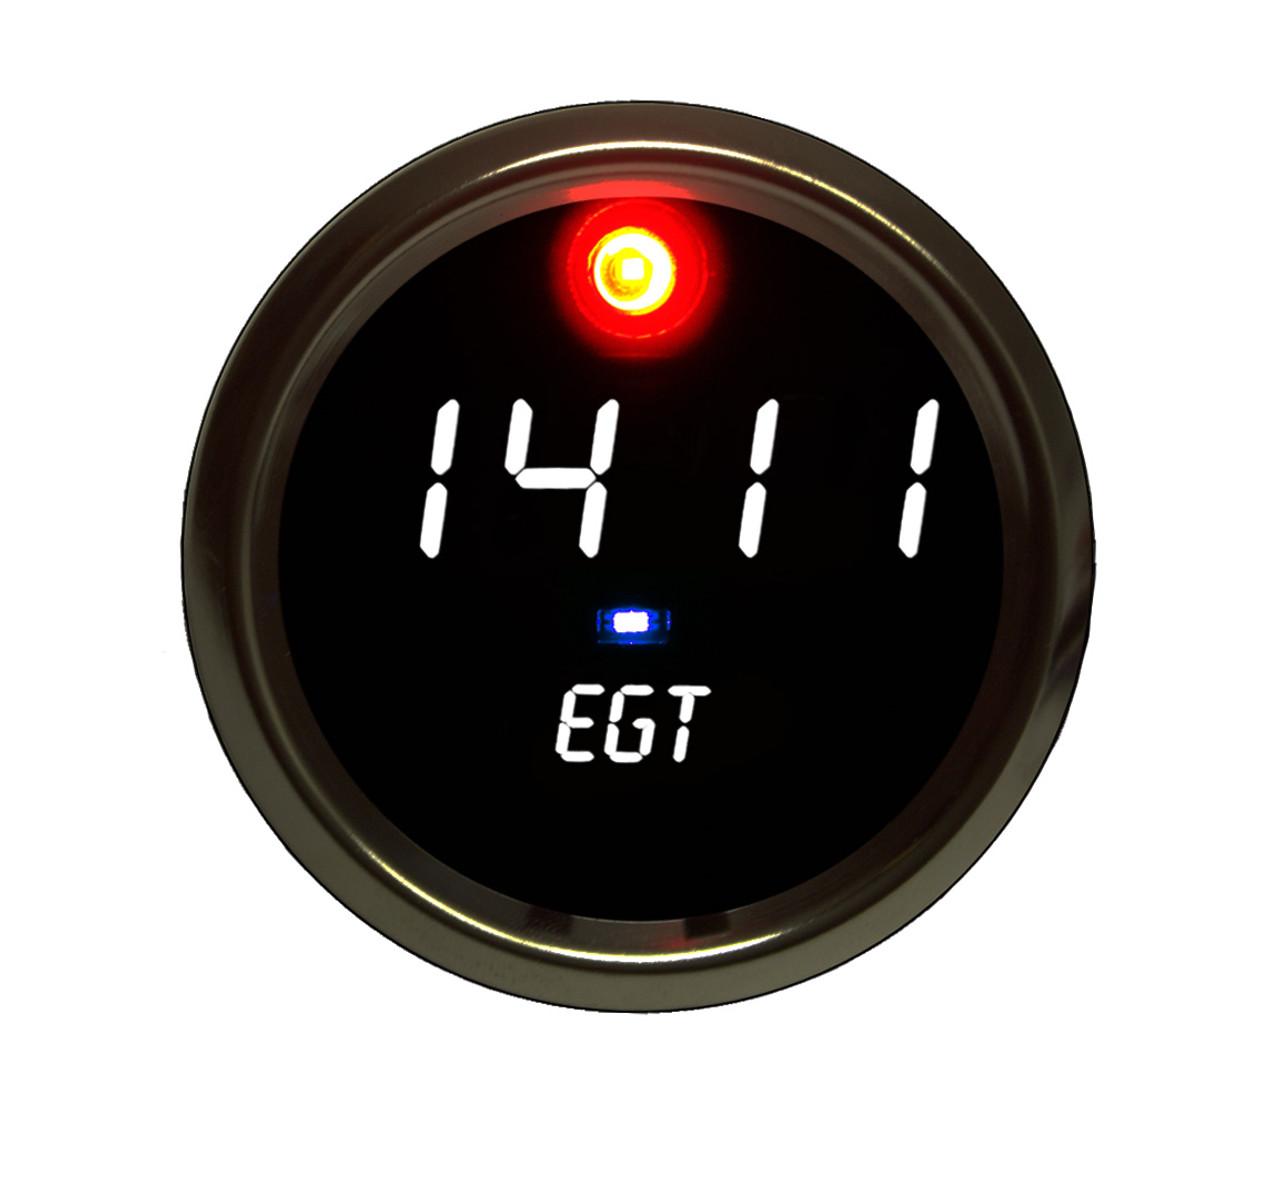 EGT Programmable Co-Pilot Gauge Chrome Bezel - WHITE